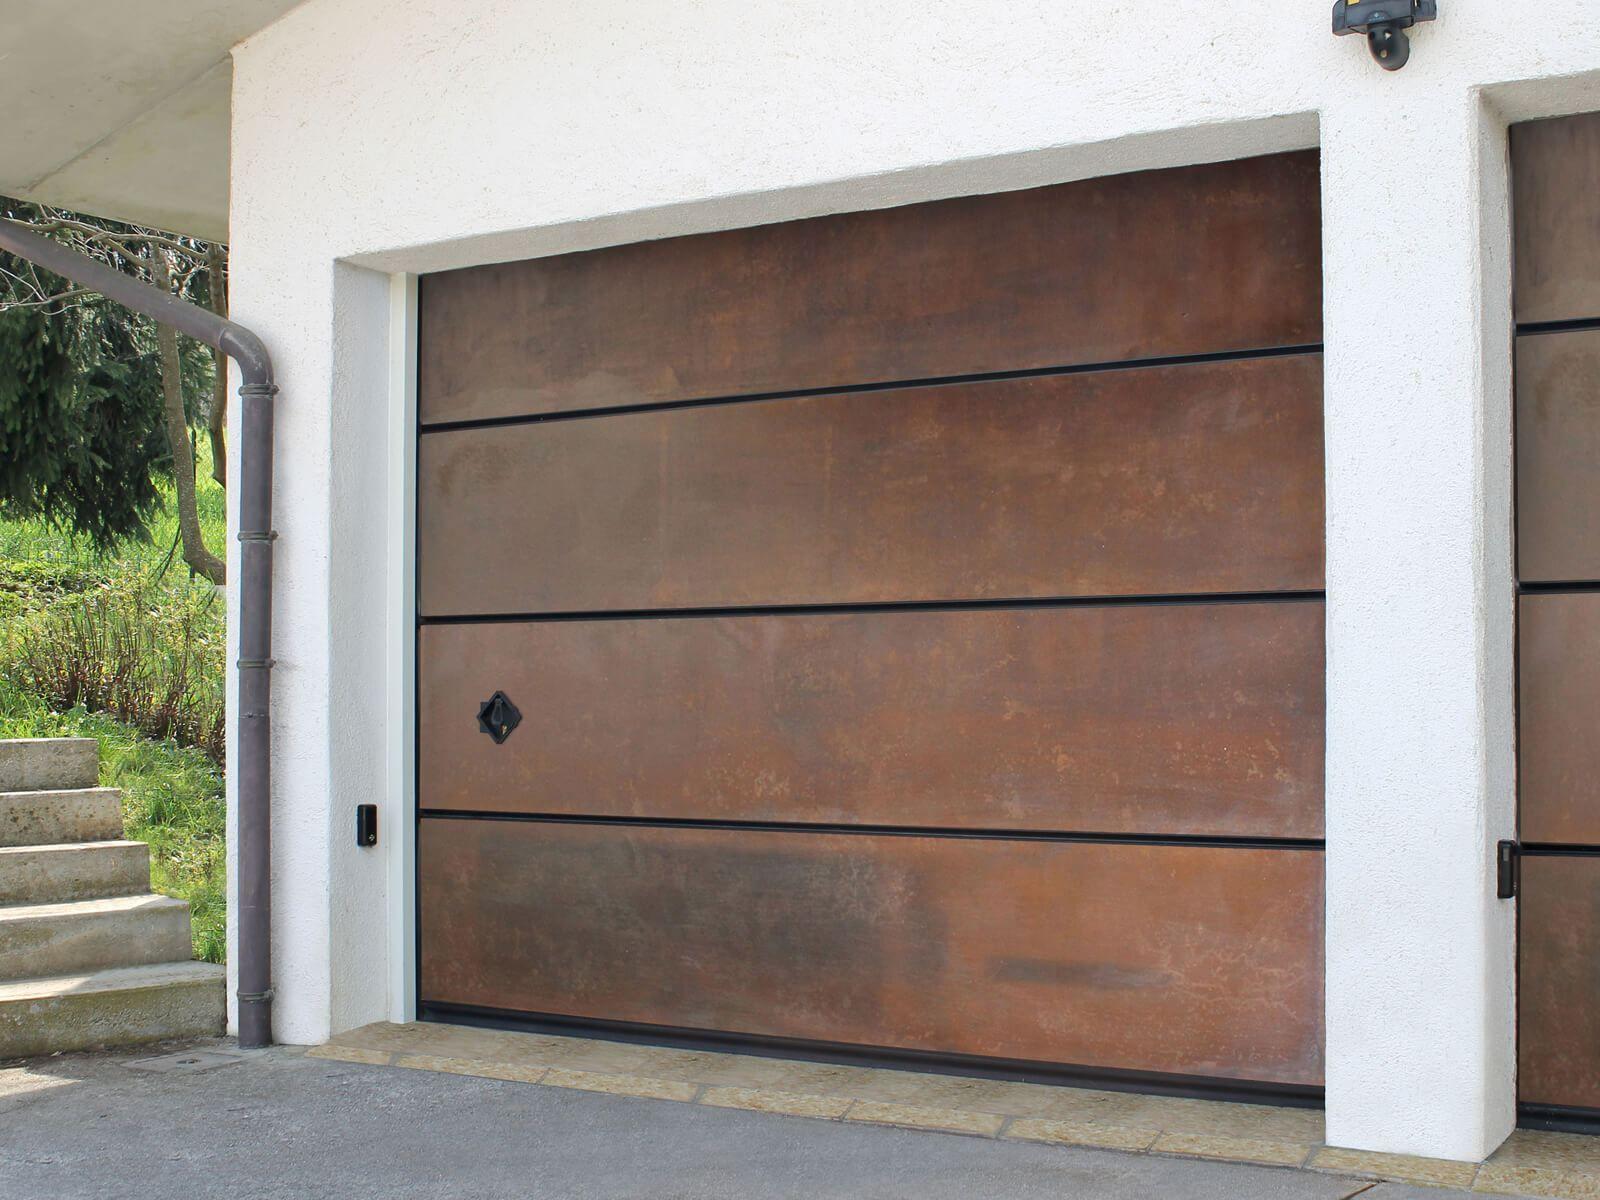 Le Perle Designer Overhead Garage Doors By Breda Are One Of A Kind Custom Garage Doors Whether It Is A Masterpiece Garage Door Or Interior Dividing Walls The